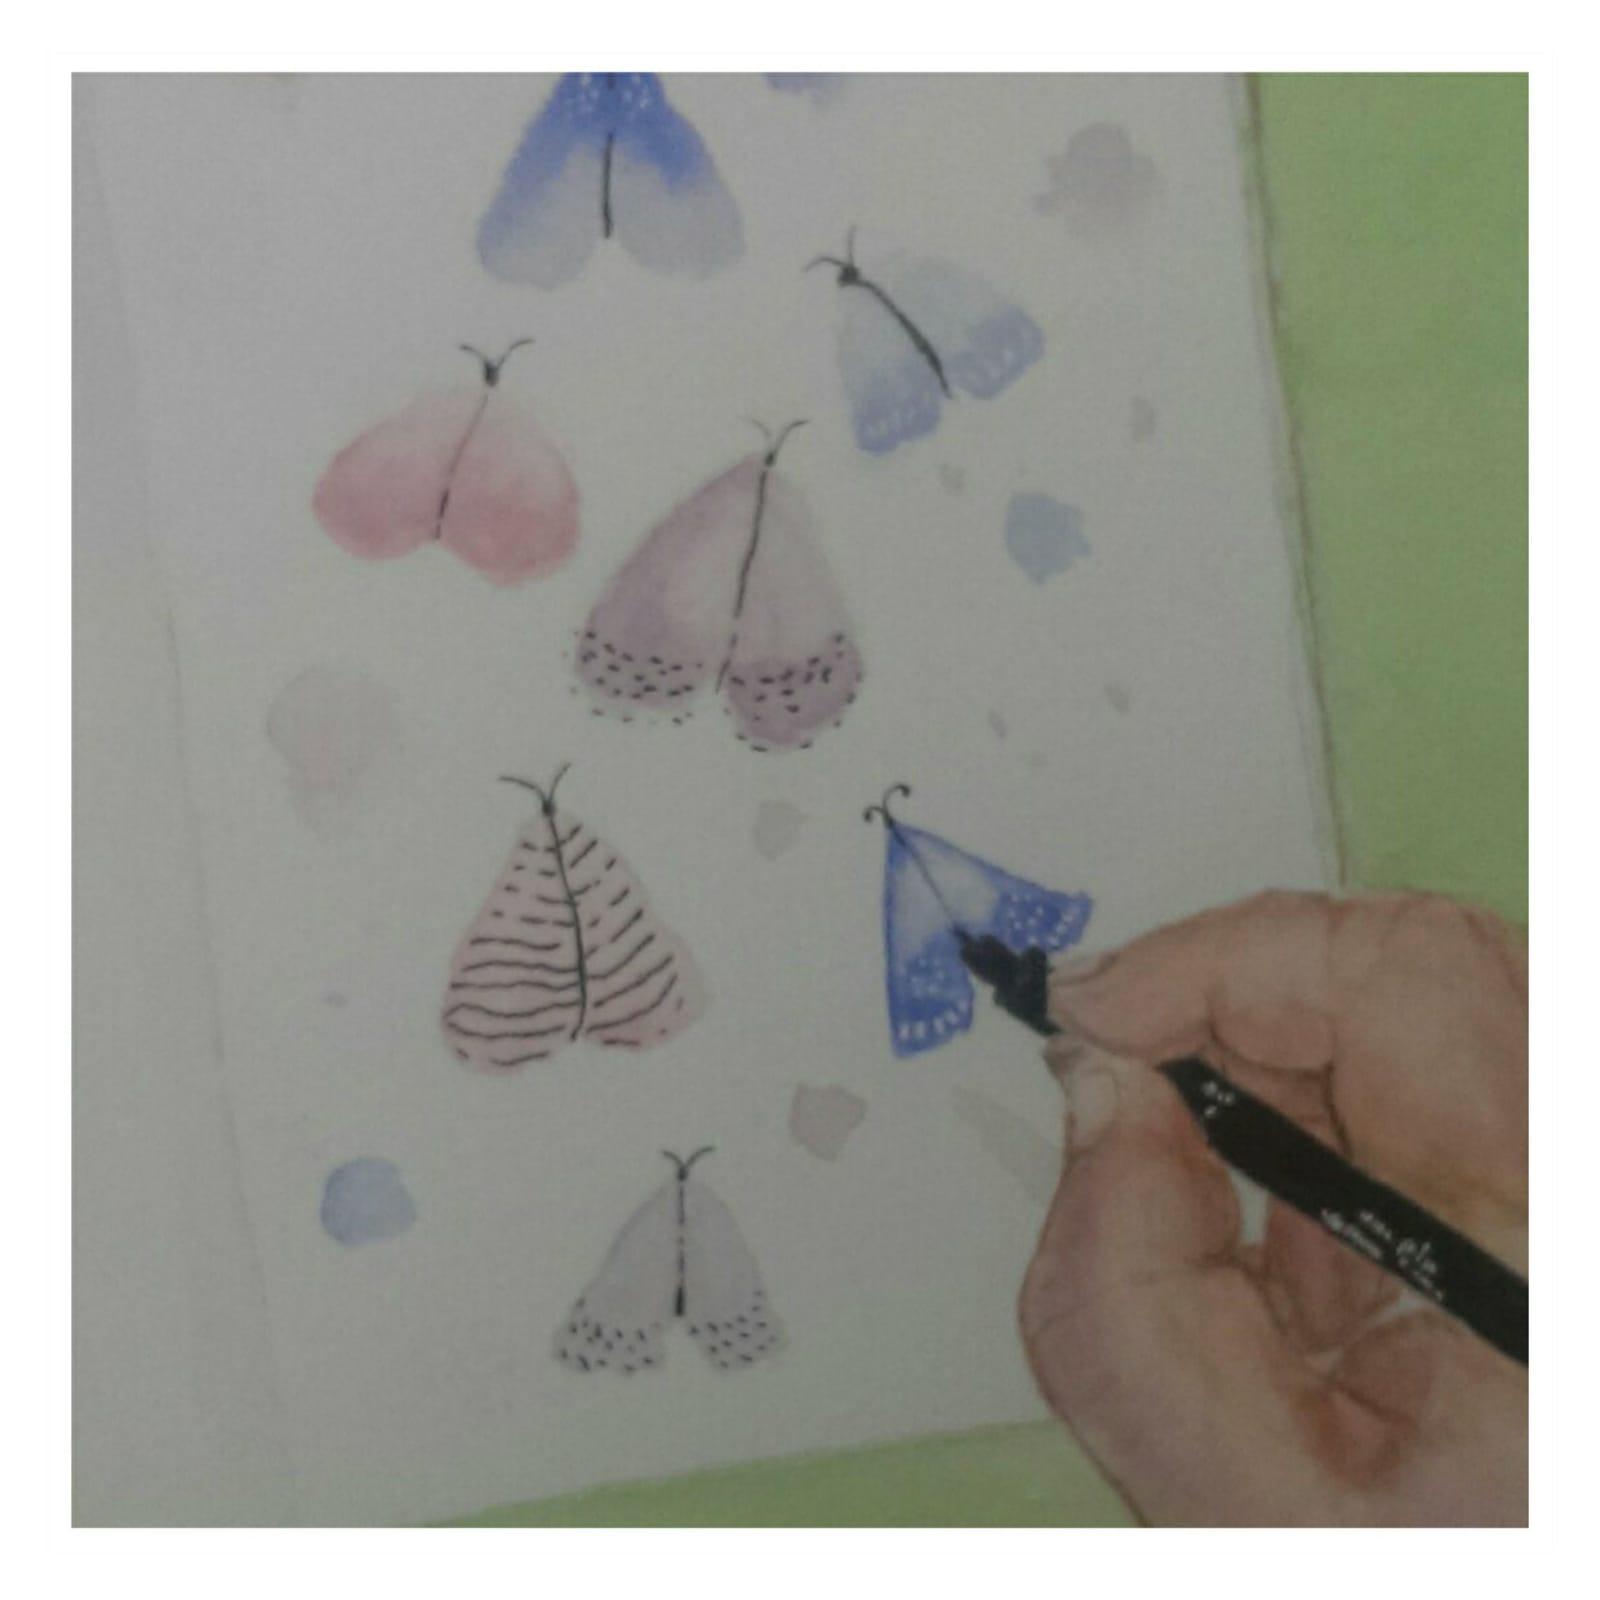 LBAS Sketchbook project